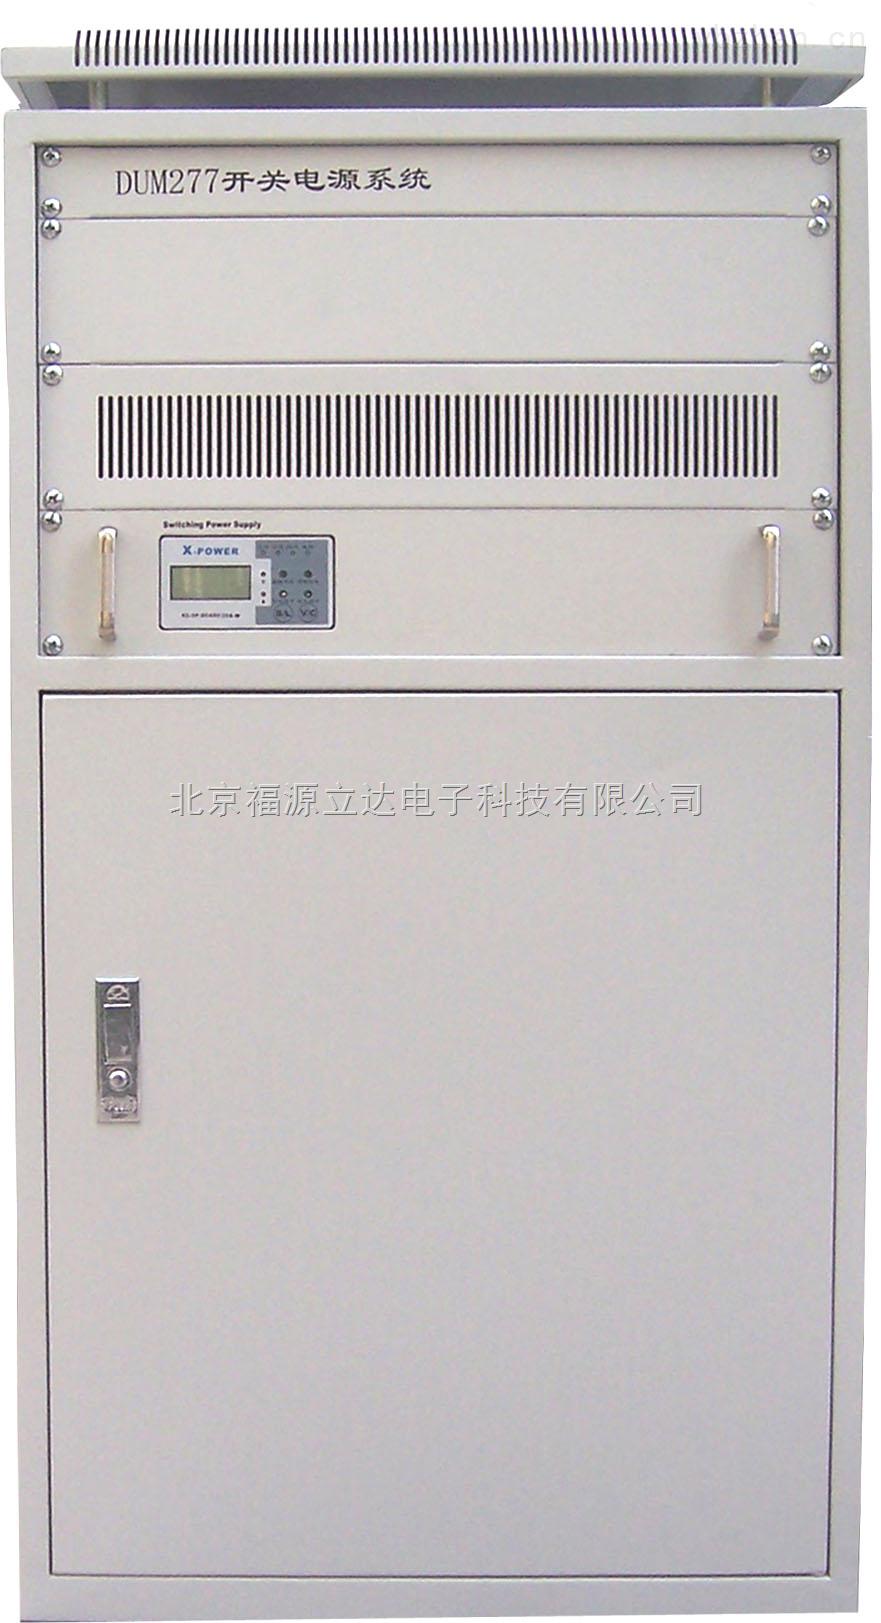 DUM277通信电源系统